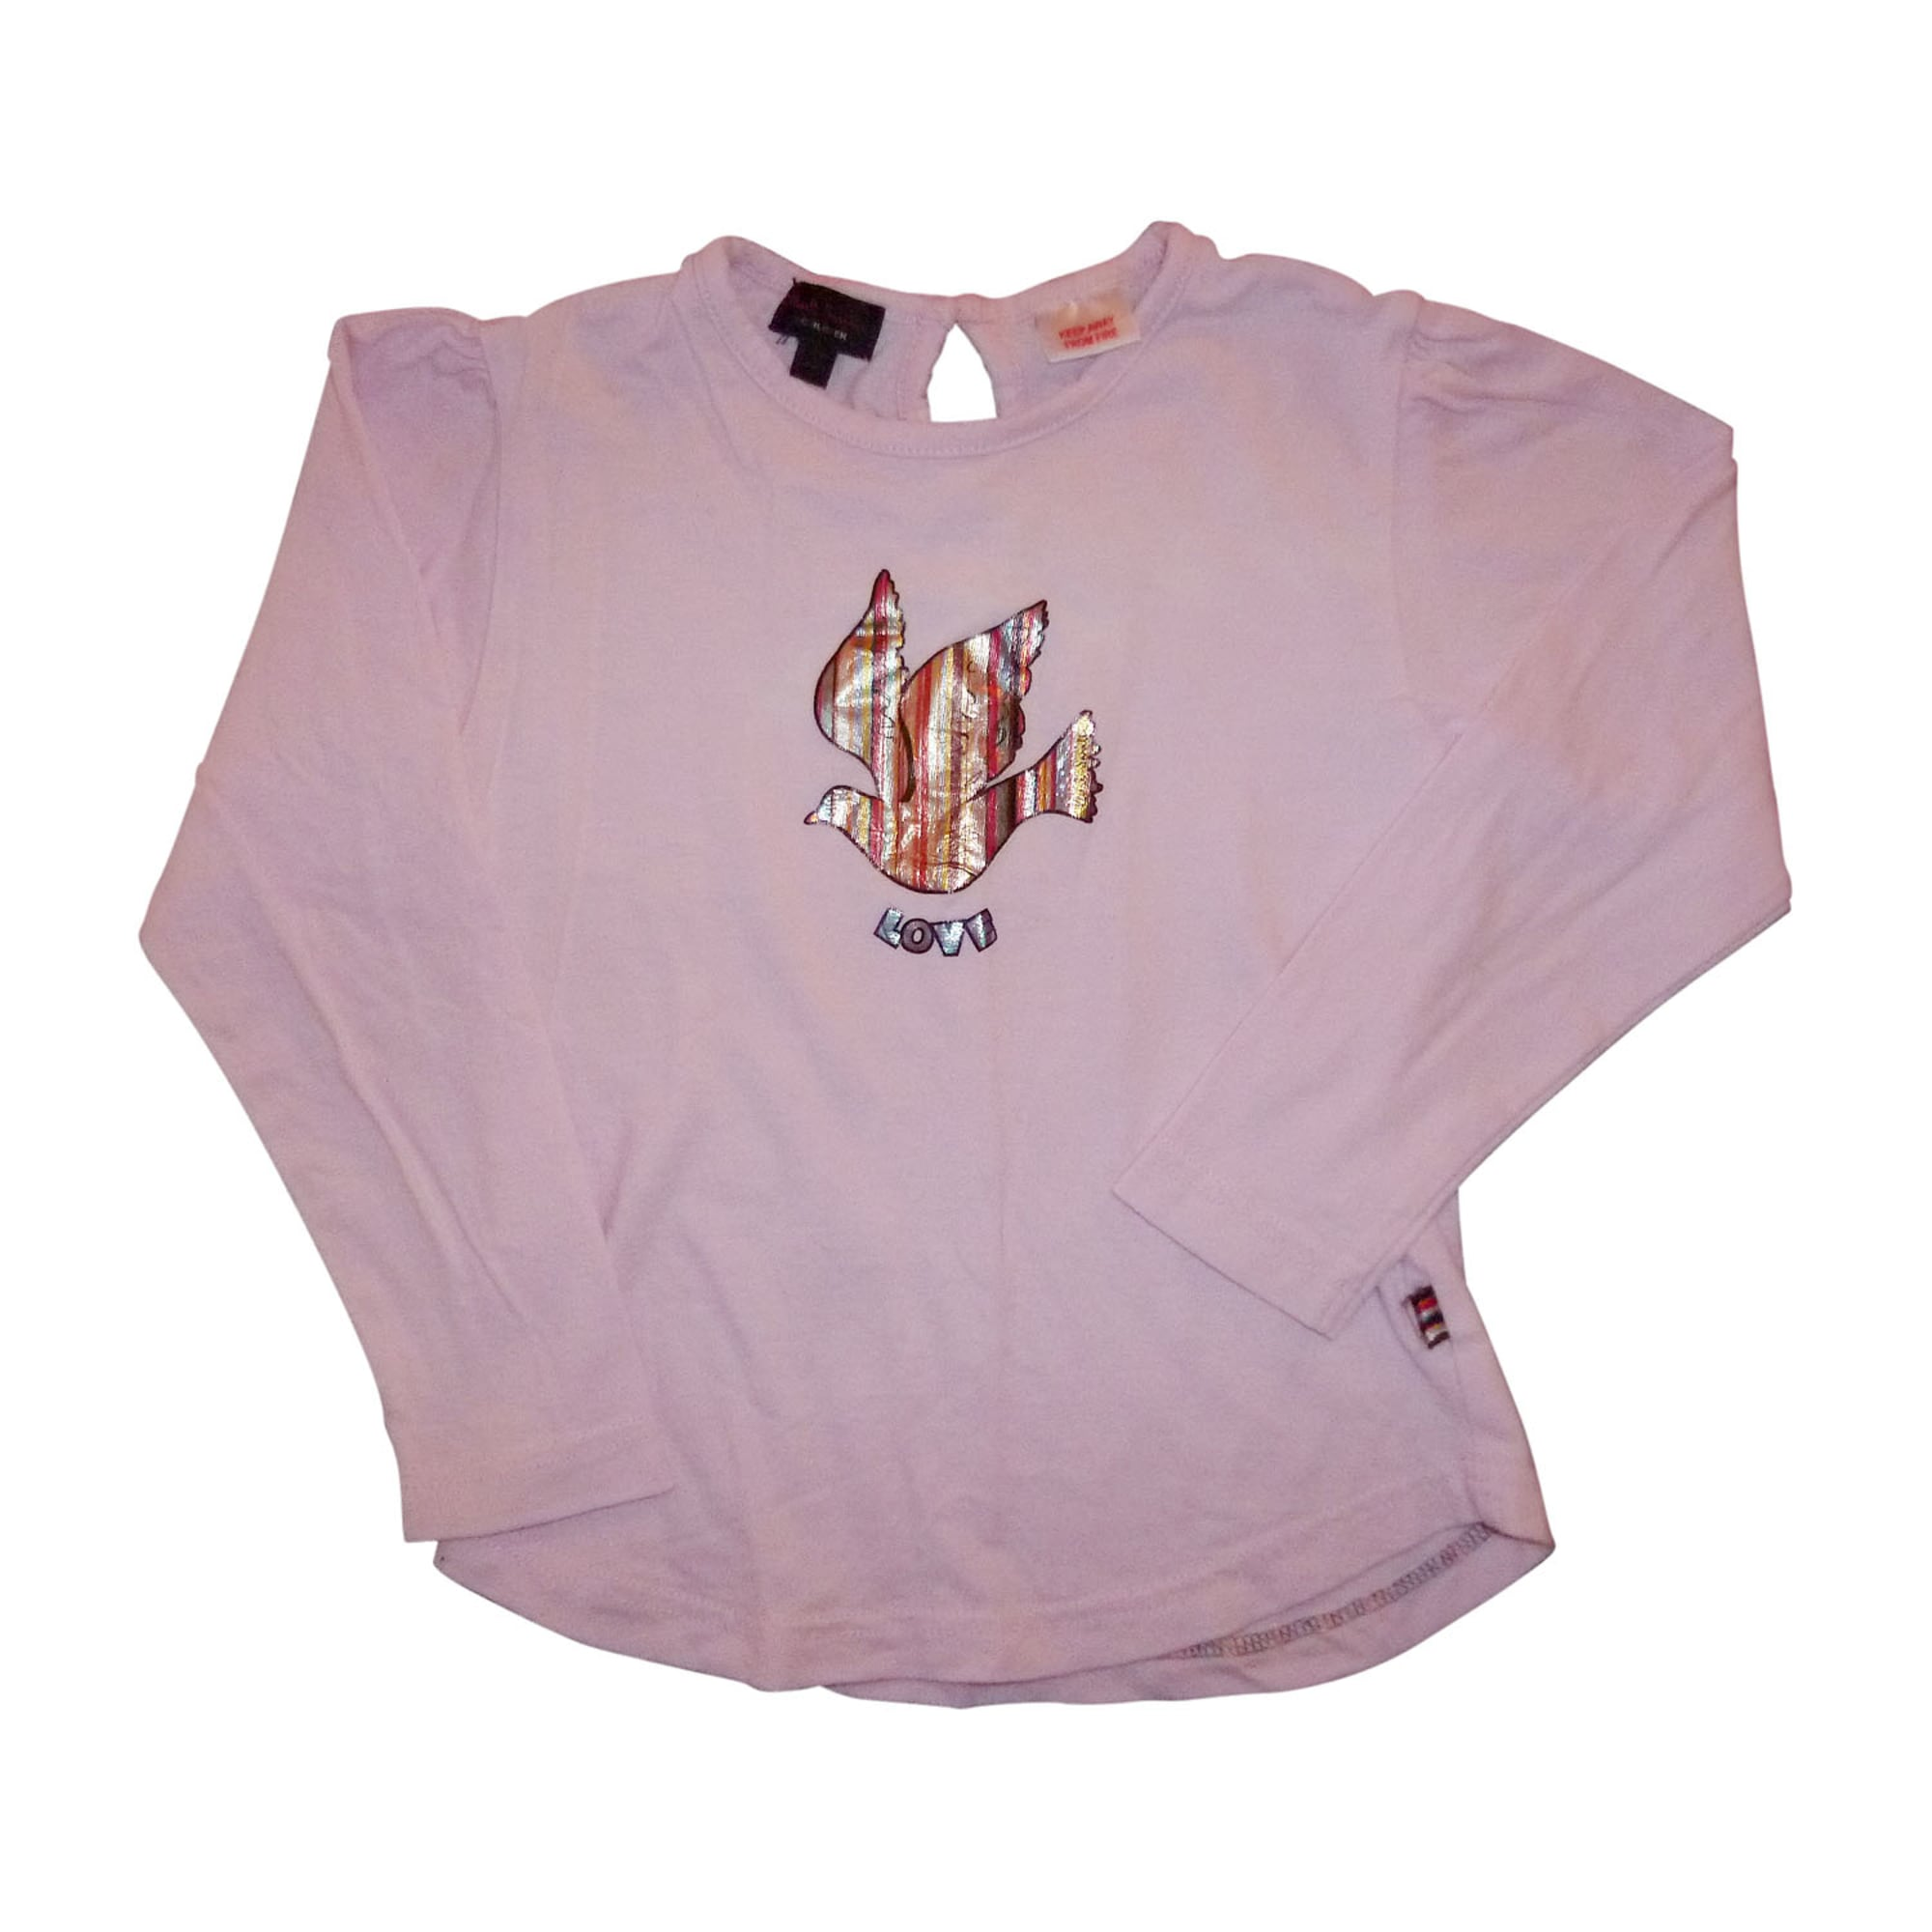 Top, Tee-shirt PAUL SMITH Rose, fuschia, vieux rose